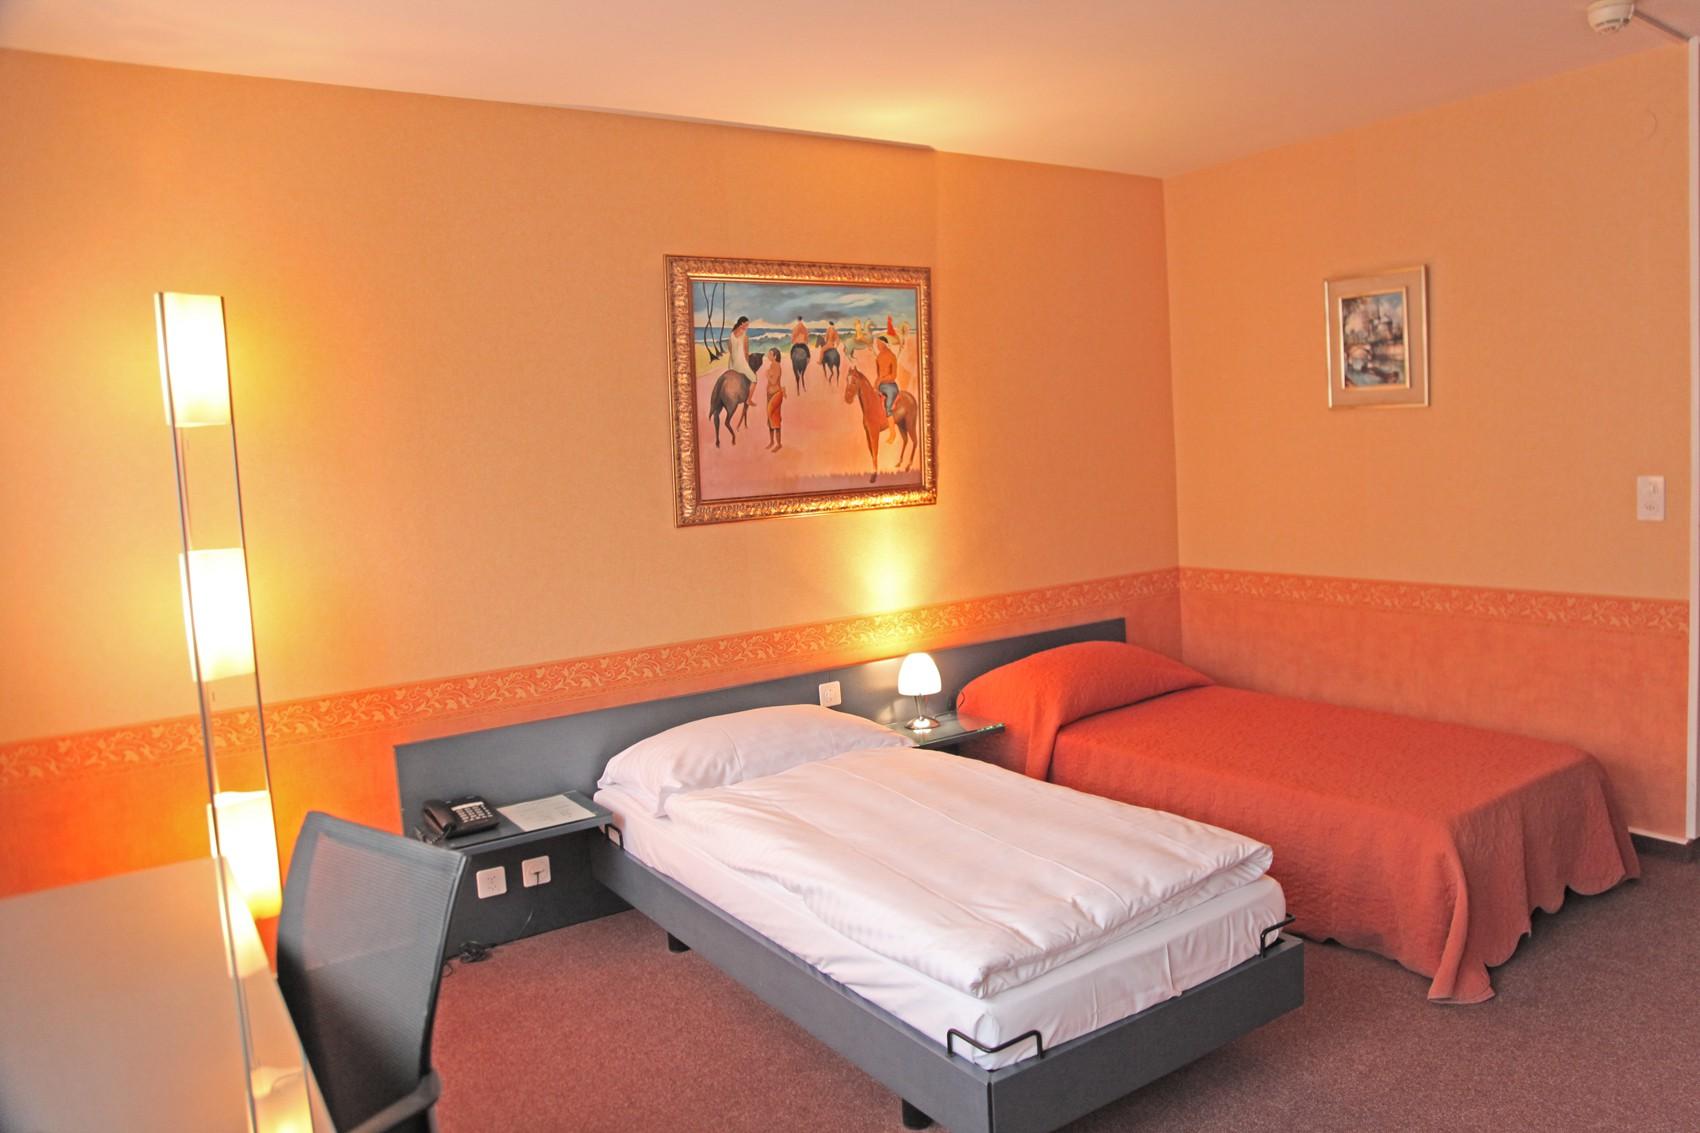 hotel-pres-hopital-cantonal-geneve